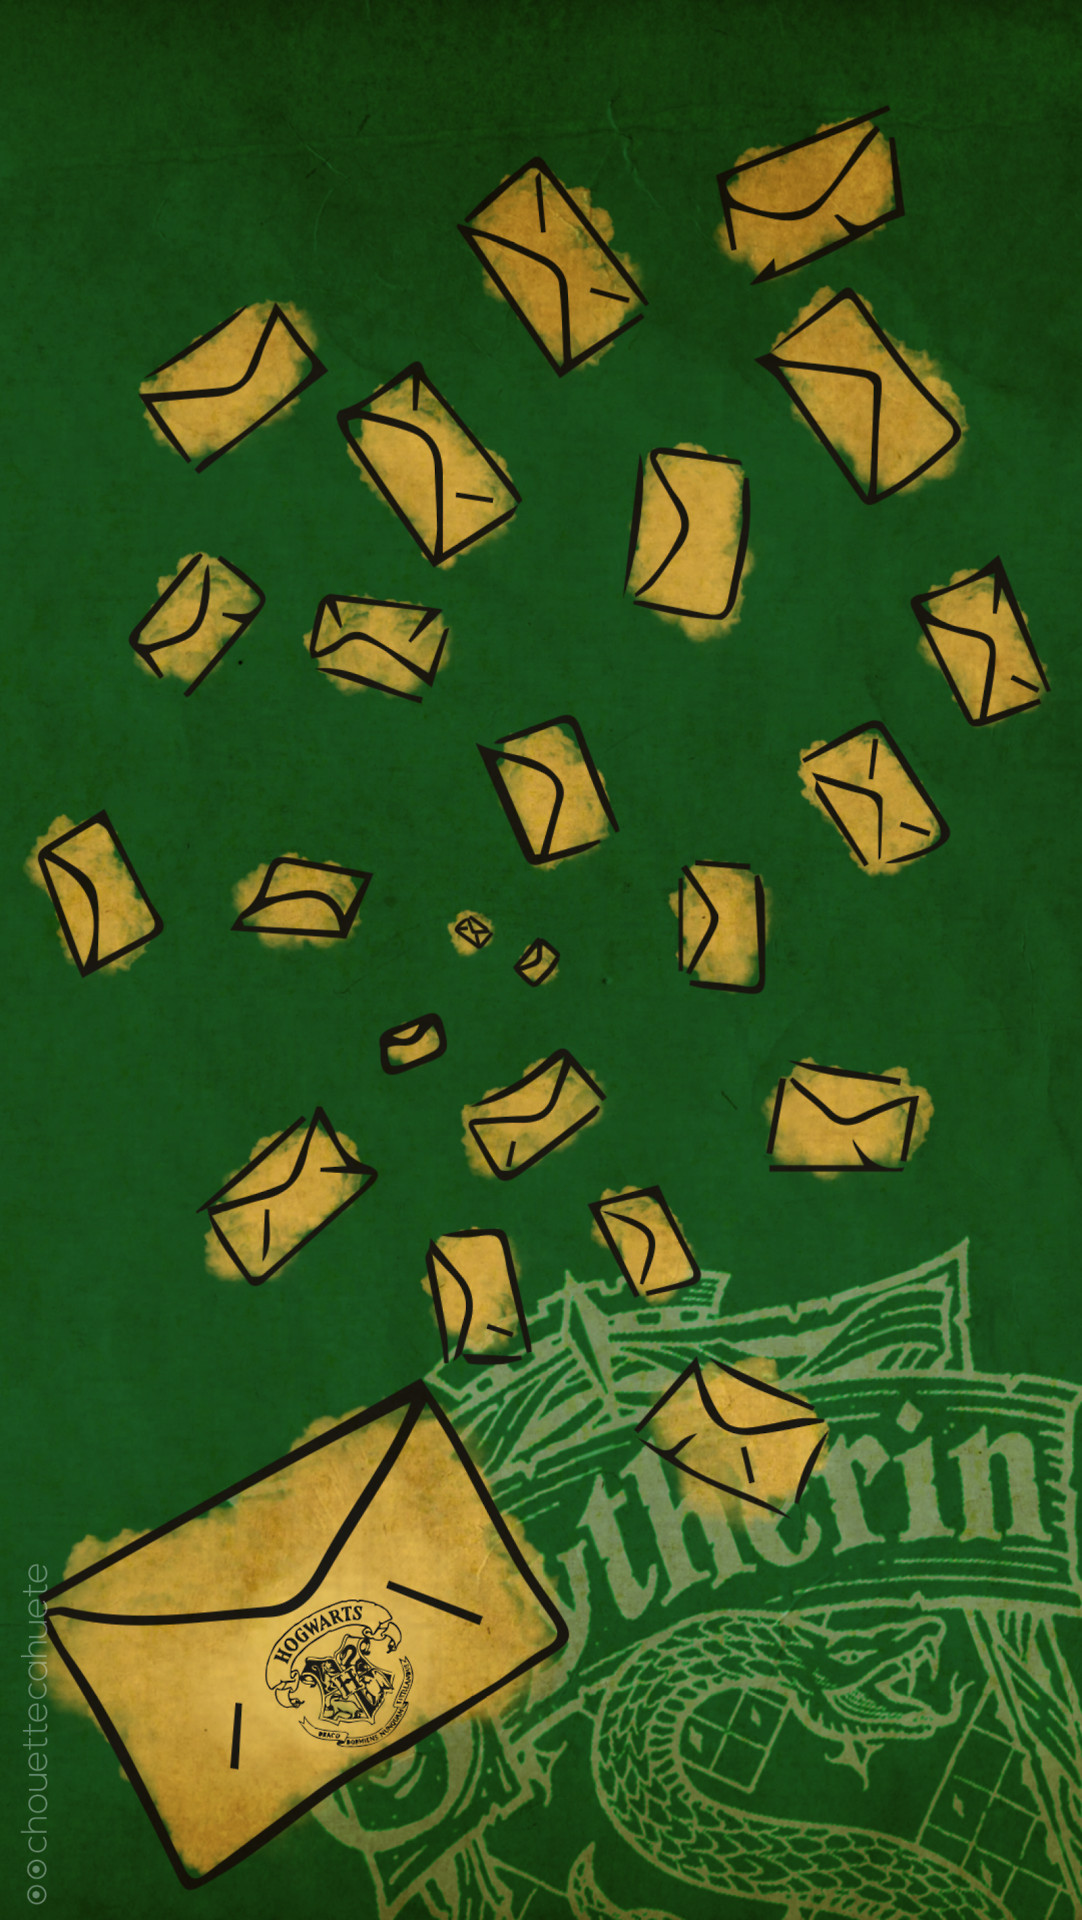 1082x1920, Hogwarts Harry Potter Hogwarts Letter Gryffondor - Slytherin - HD Wallpaper